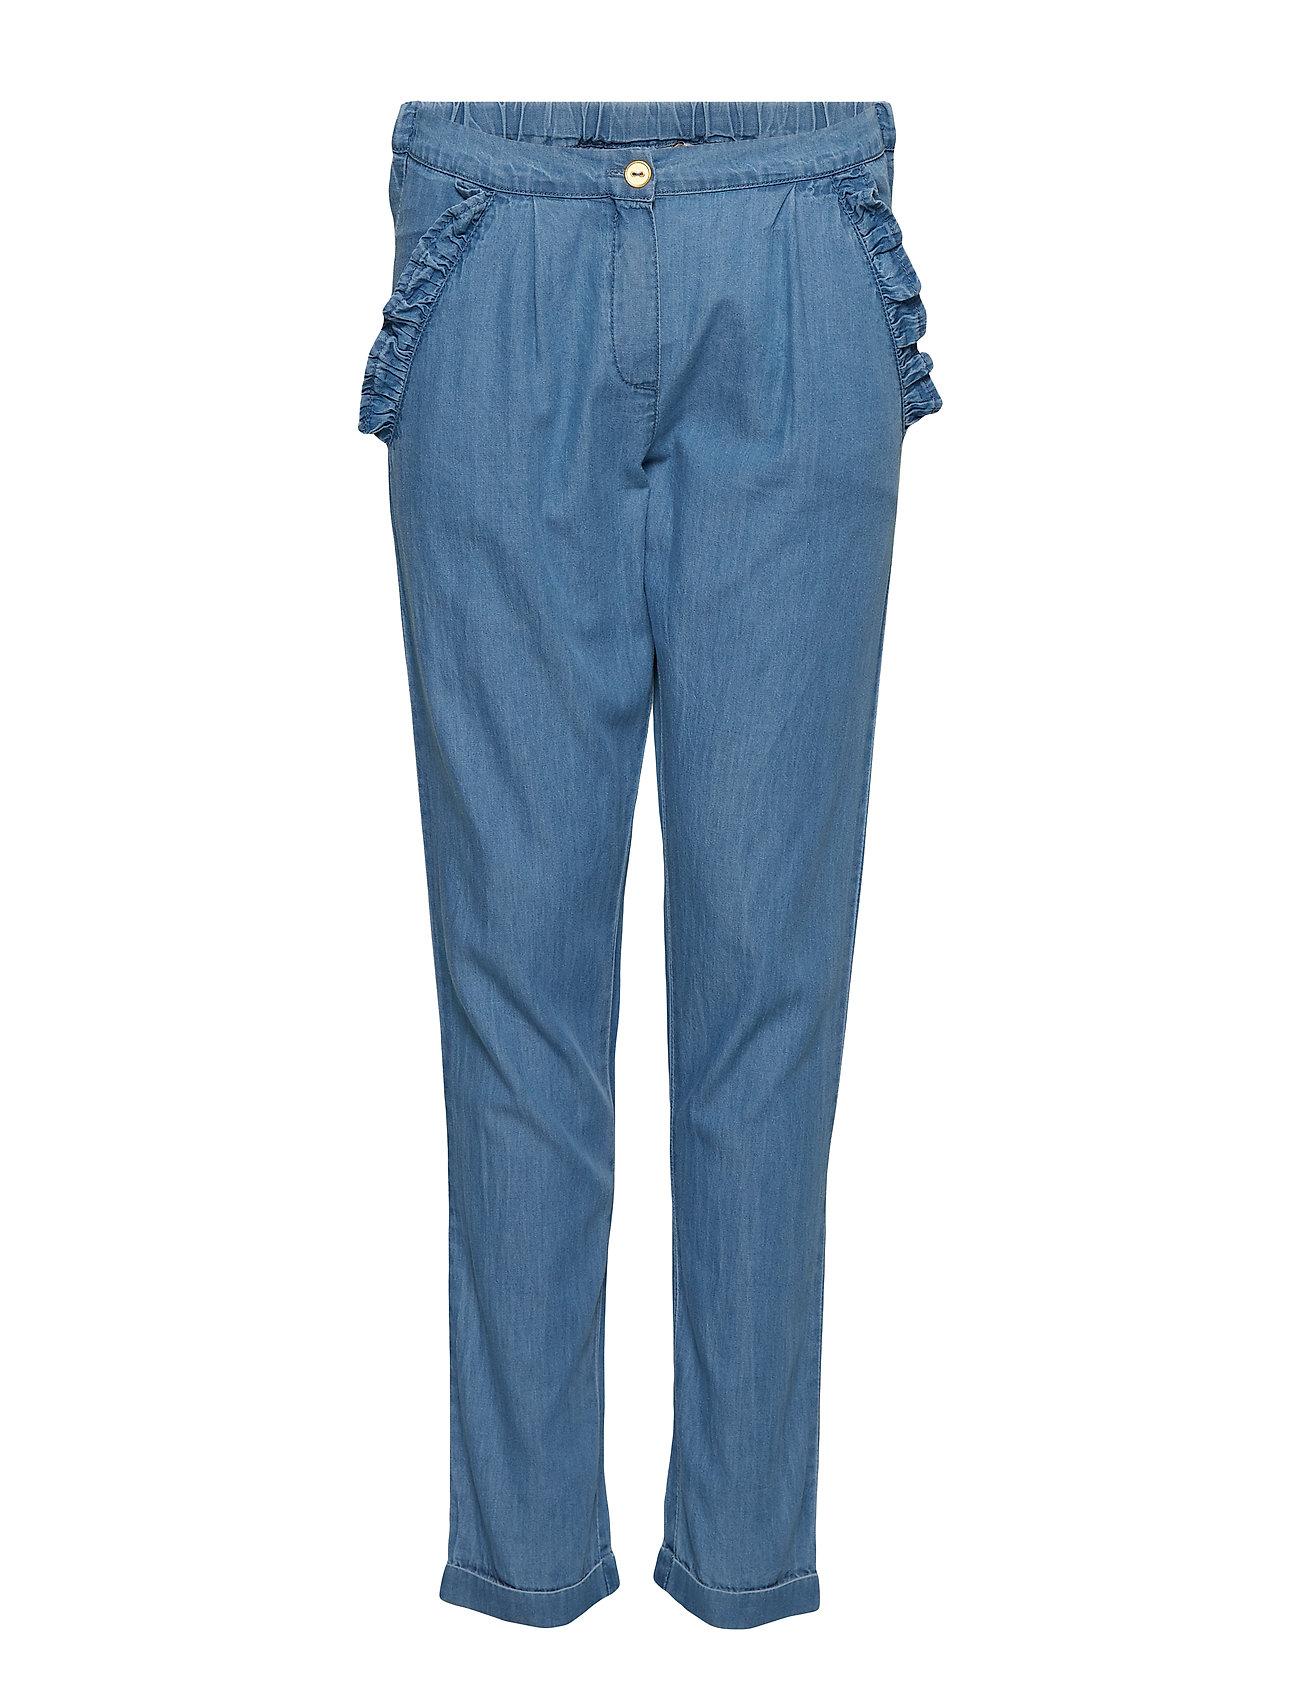 Image of Trousers Bukser Blå NOA NOA MINIATURE (3132349657)